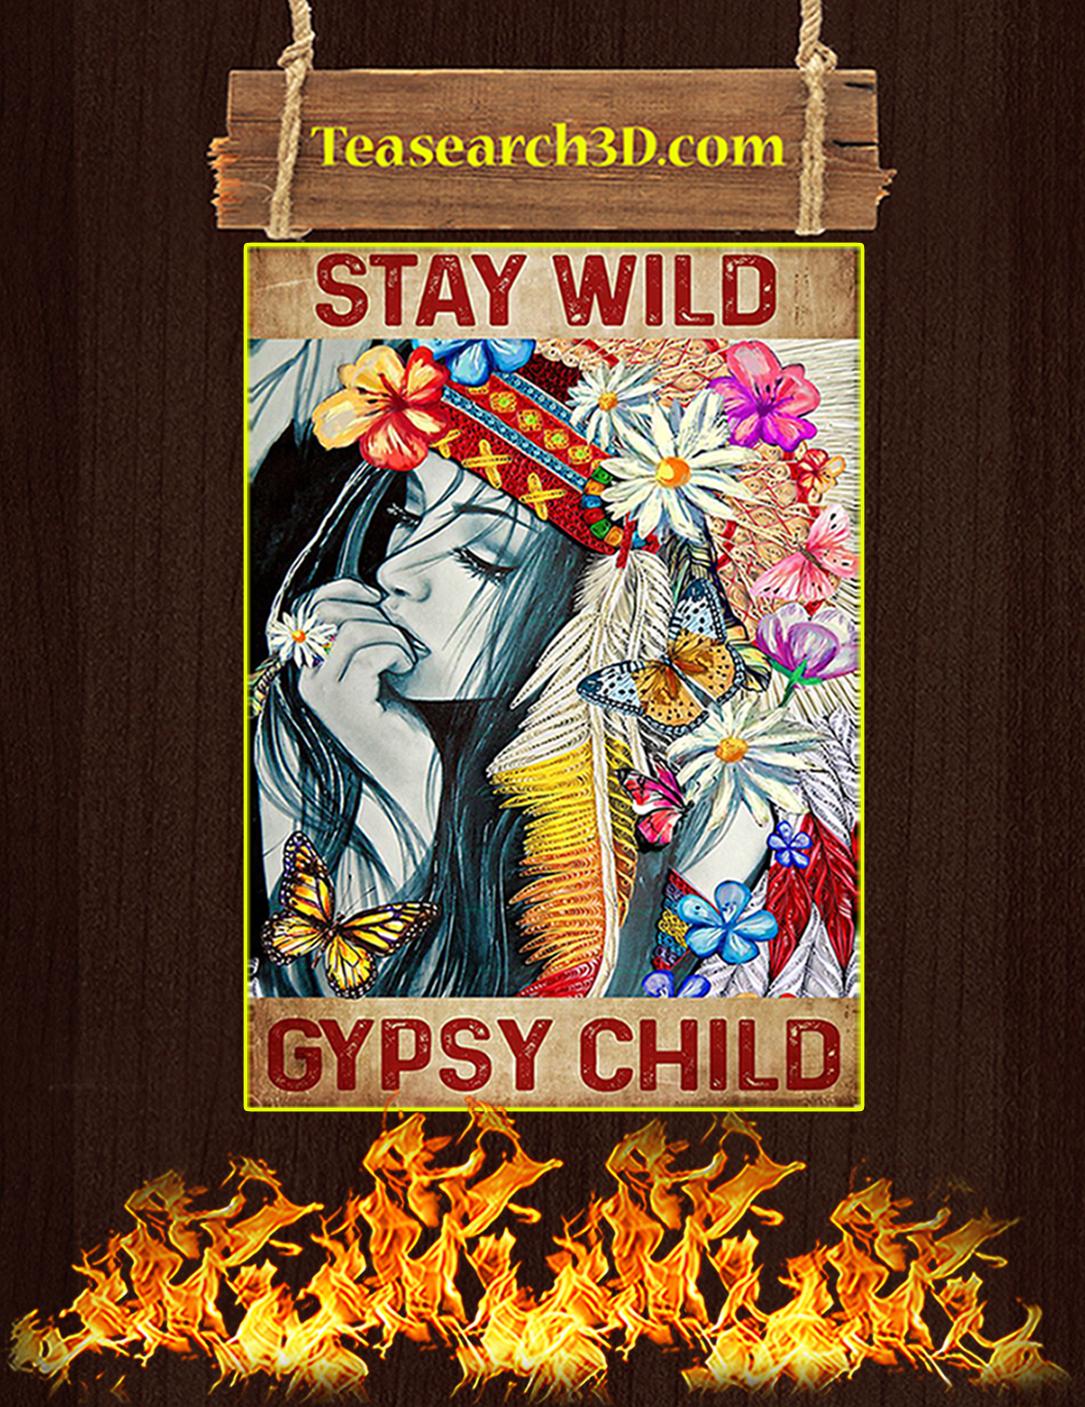 Hippie stay wild gypsy child poster A2